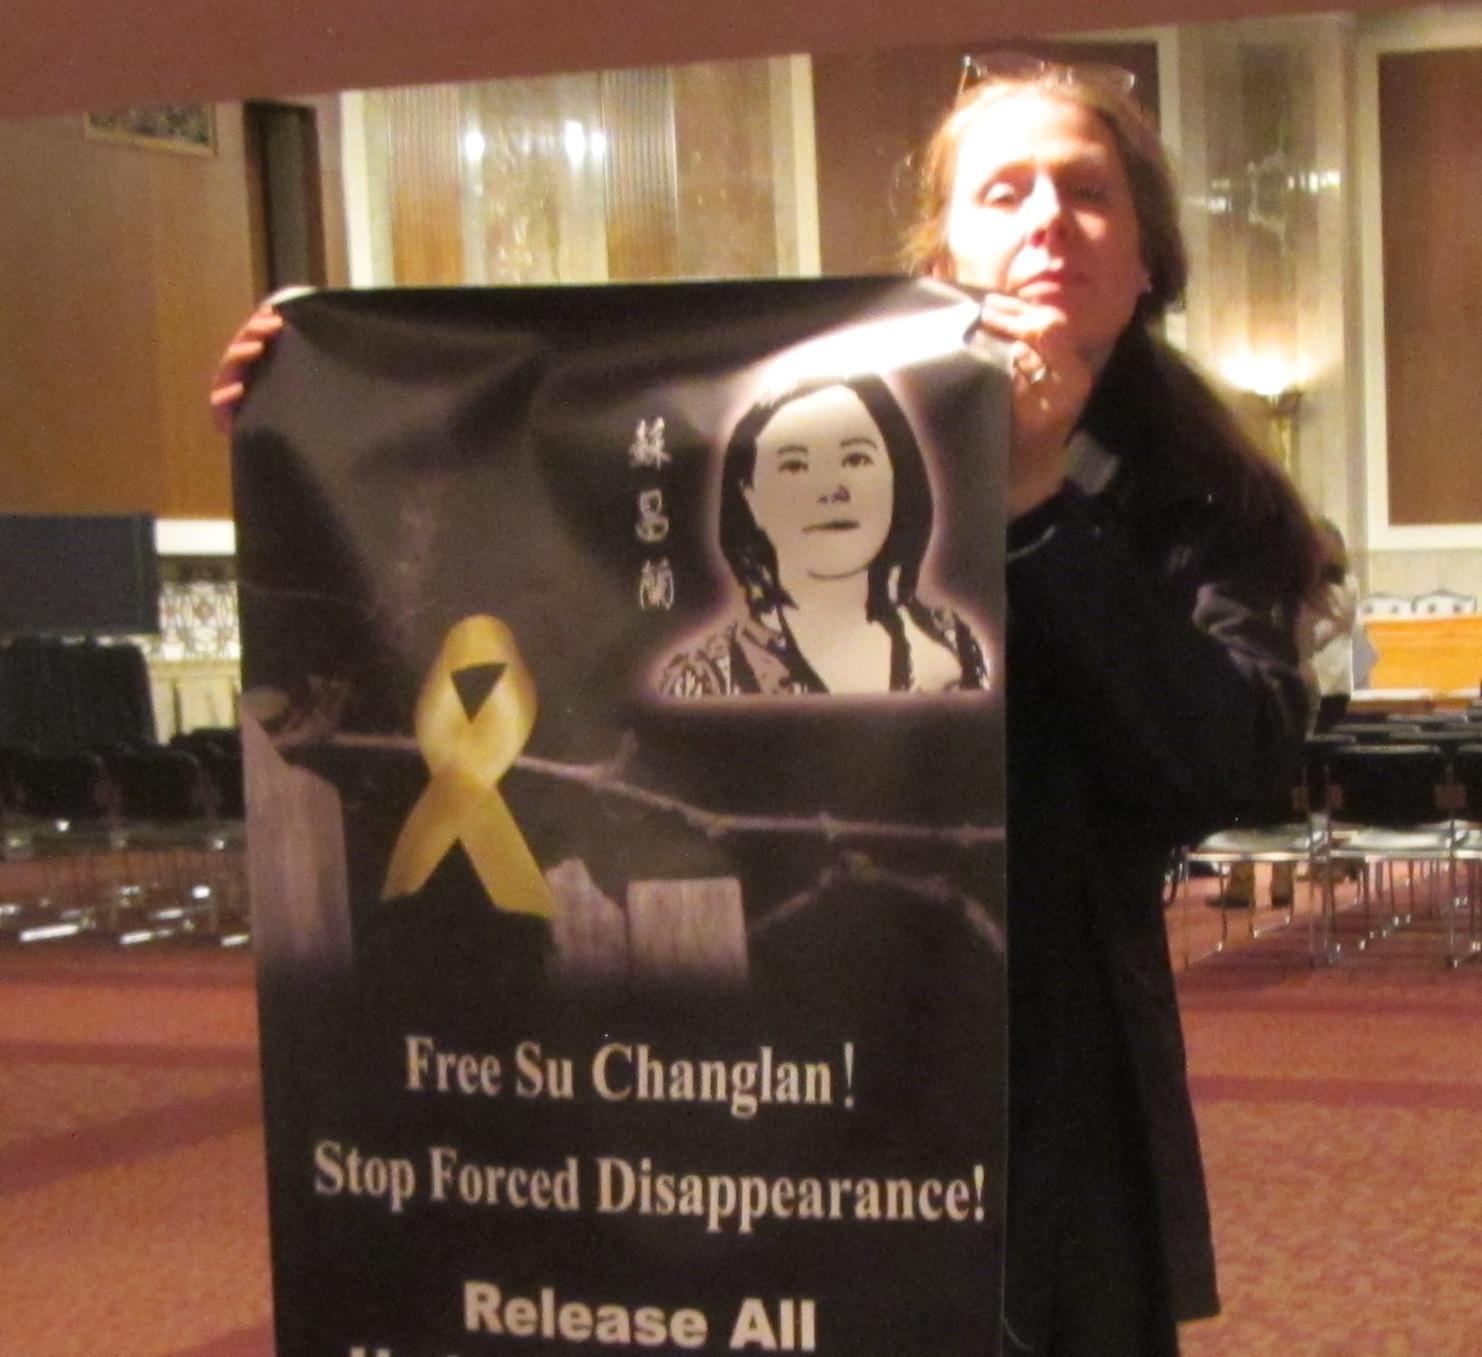 USIBC執行長Ann Noonan女士在听證會現場展示要求中共當局釋放蘇昌蘭、釋放所有支持香港占中人士的橫幅